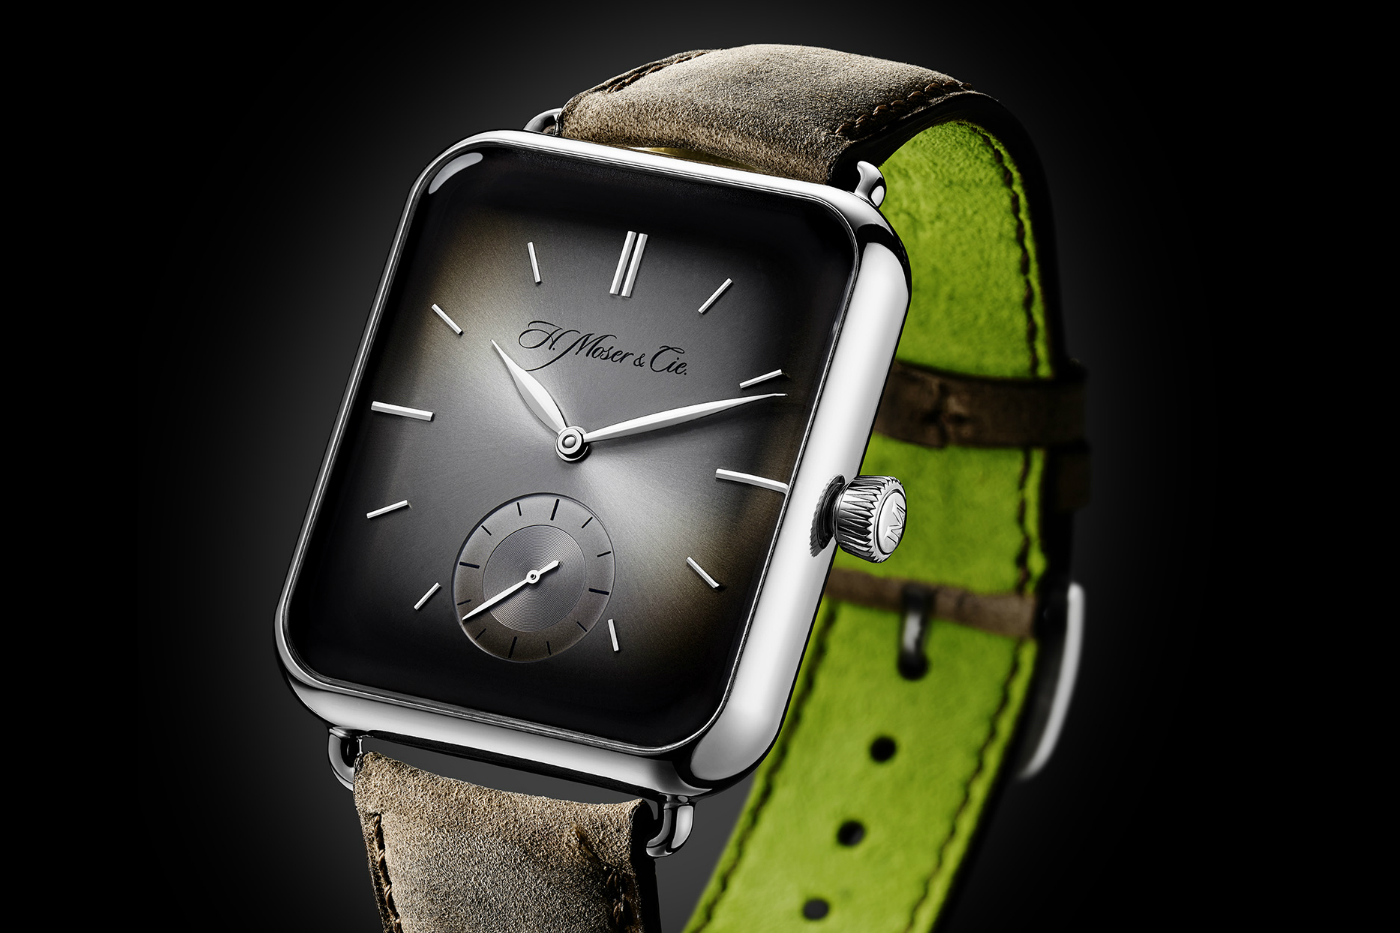 The Swiss Alp Watch is unashamedly an Apple Watch rip-off